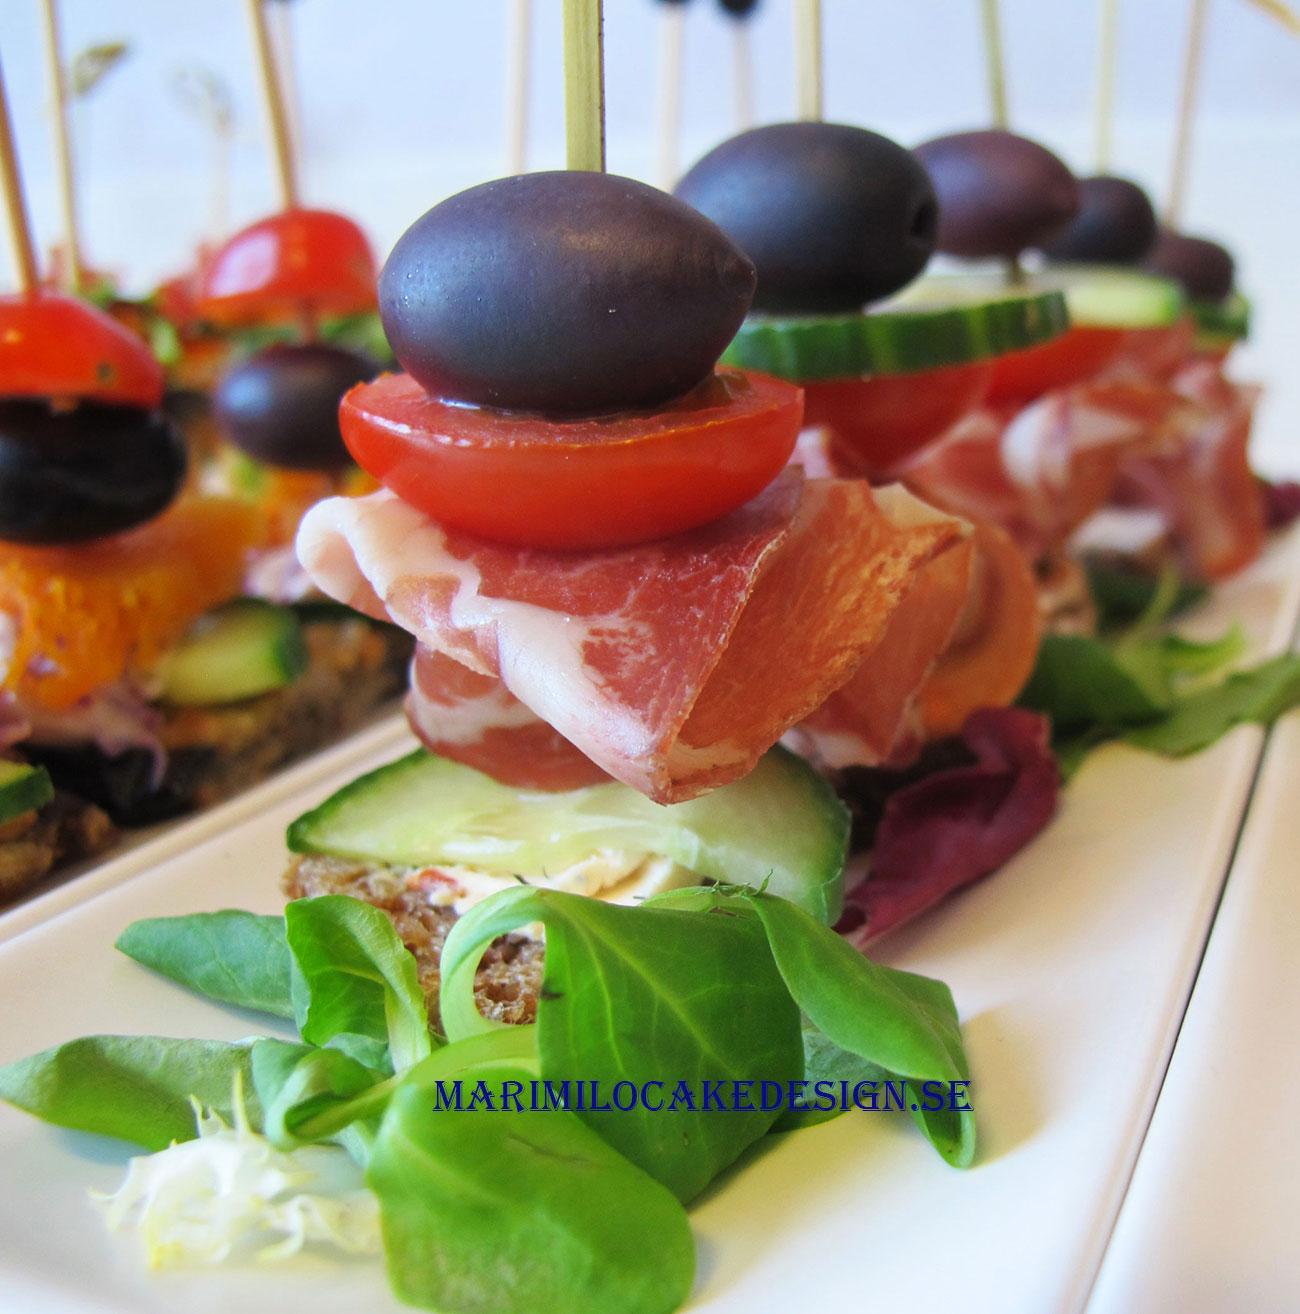 mingelmat-catering-ostermalm-plockmat